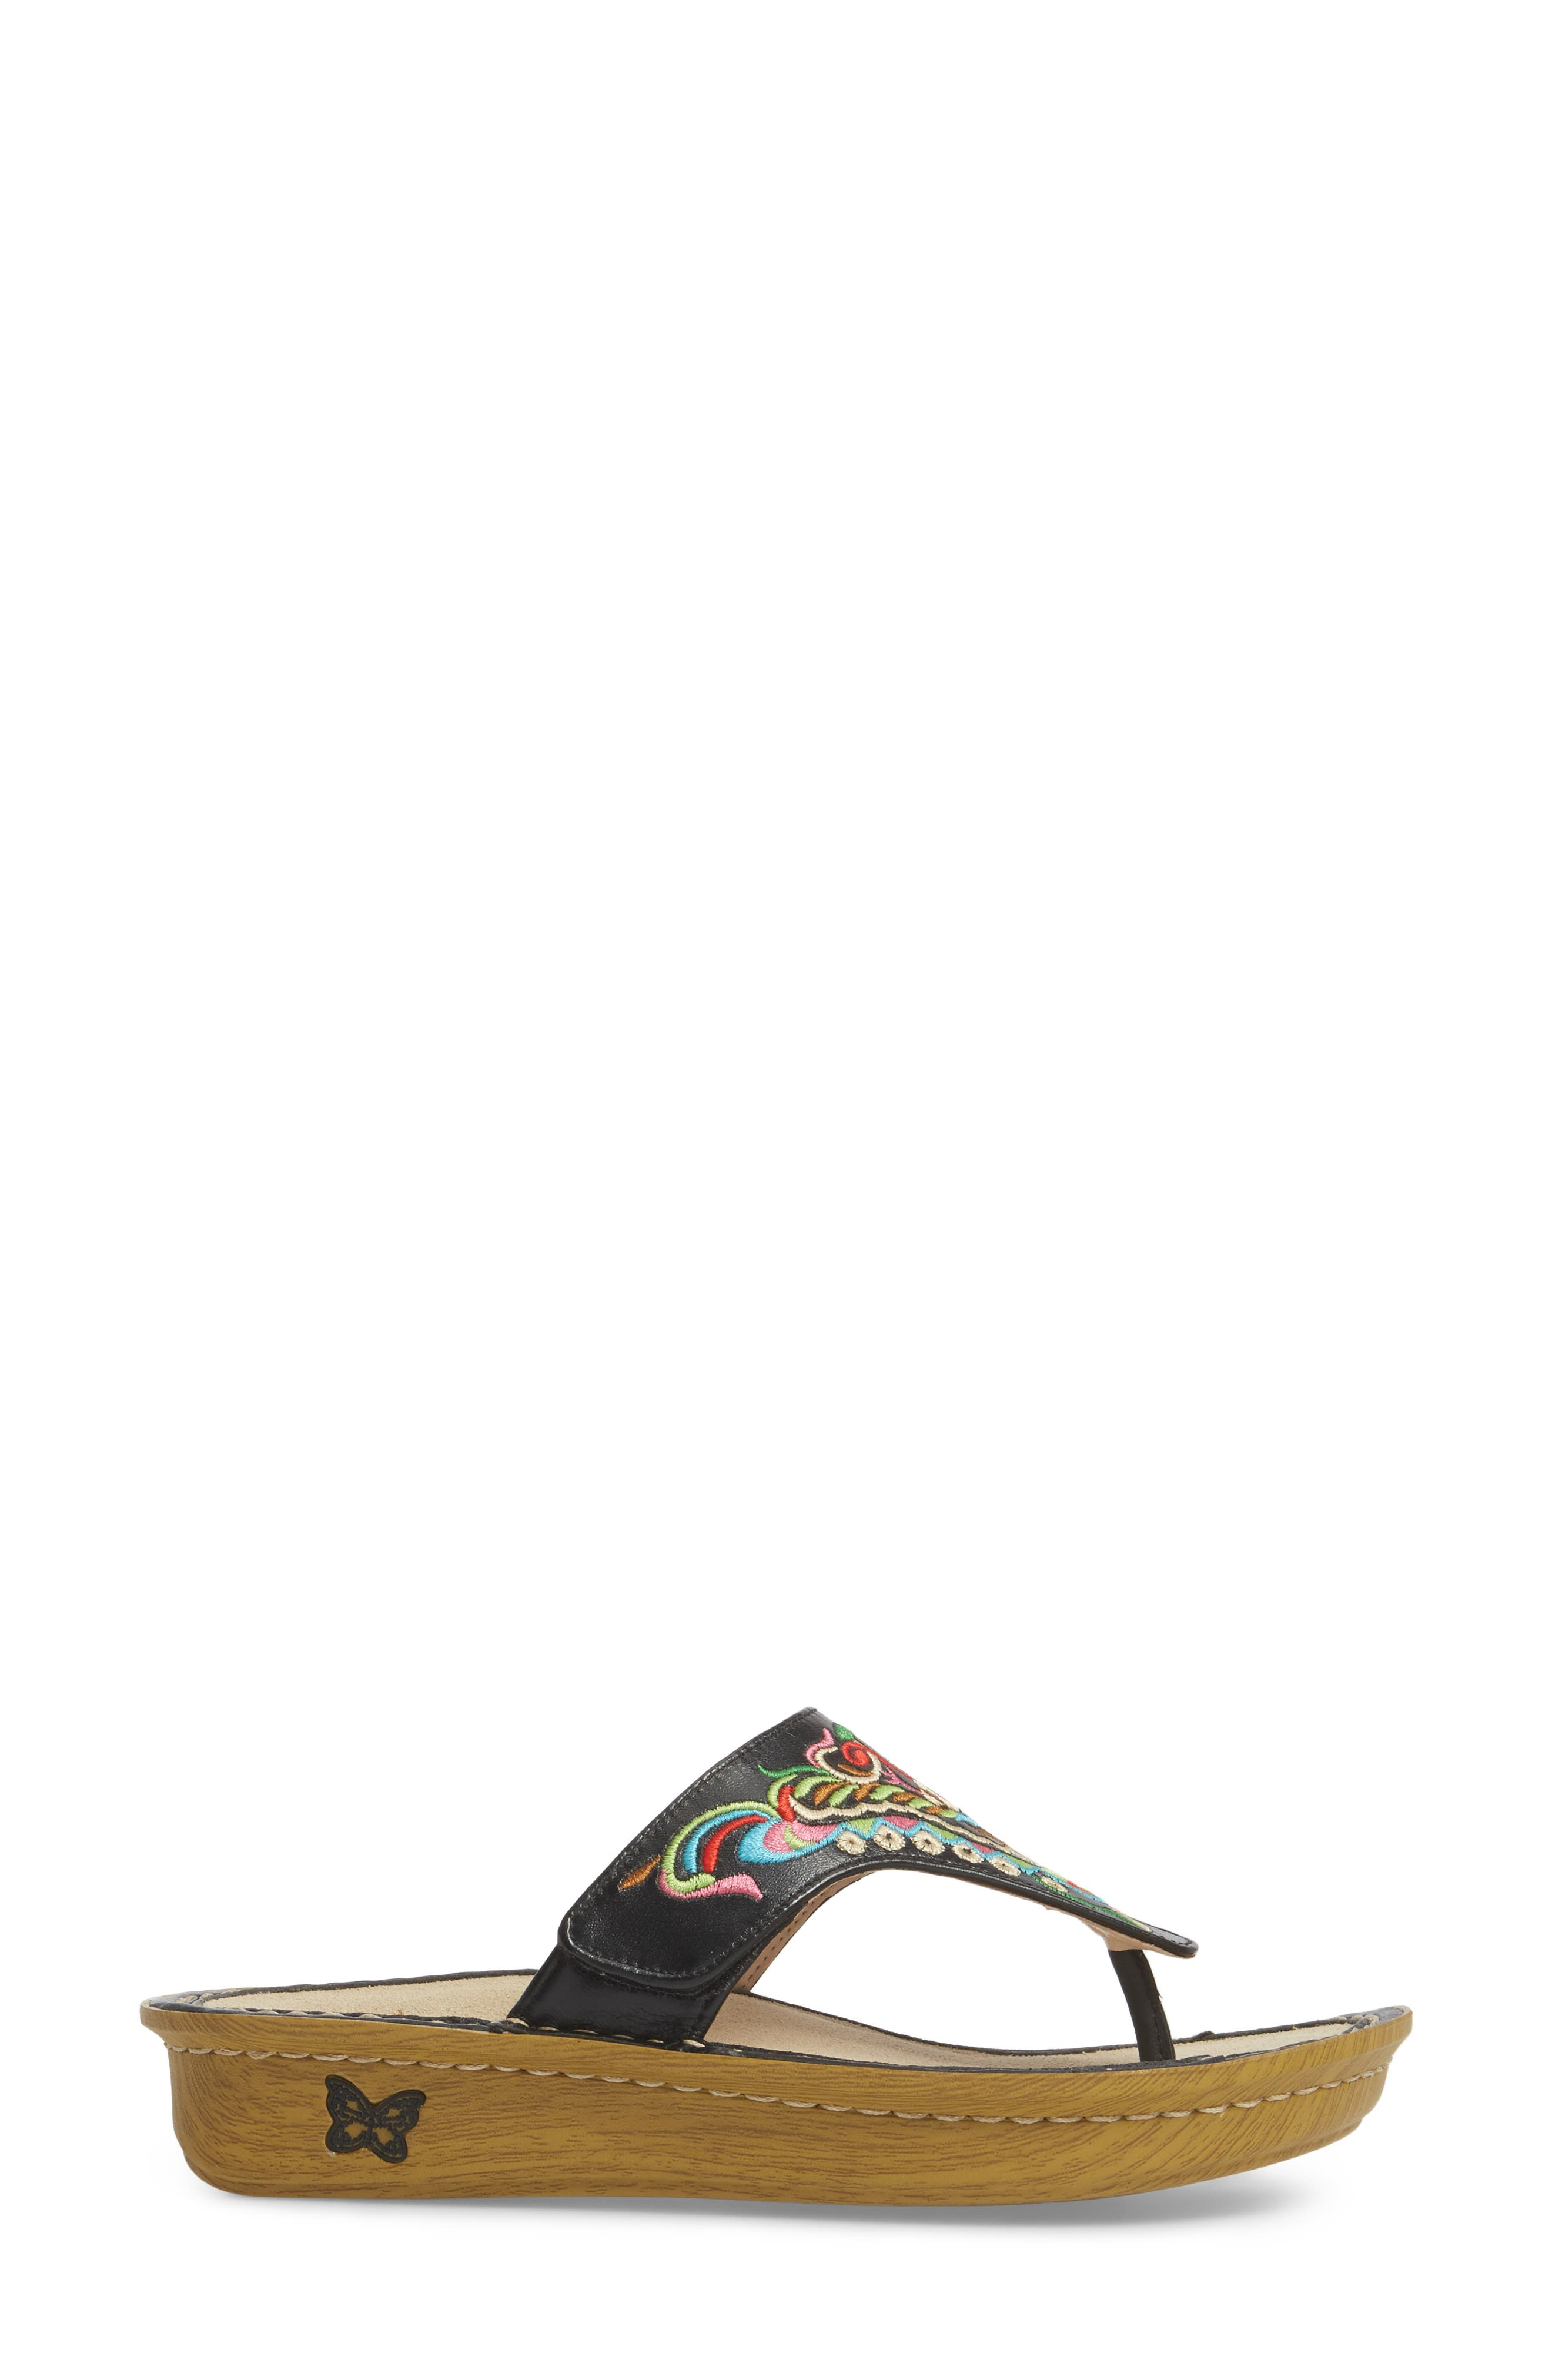 'Vanessa' Thong Sandal,                             Alternate thumbnail 3, color,                             CHRYSALIS BLACK LEATHER